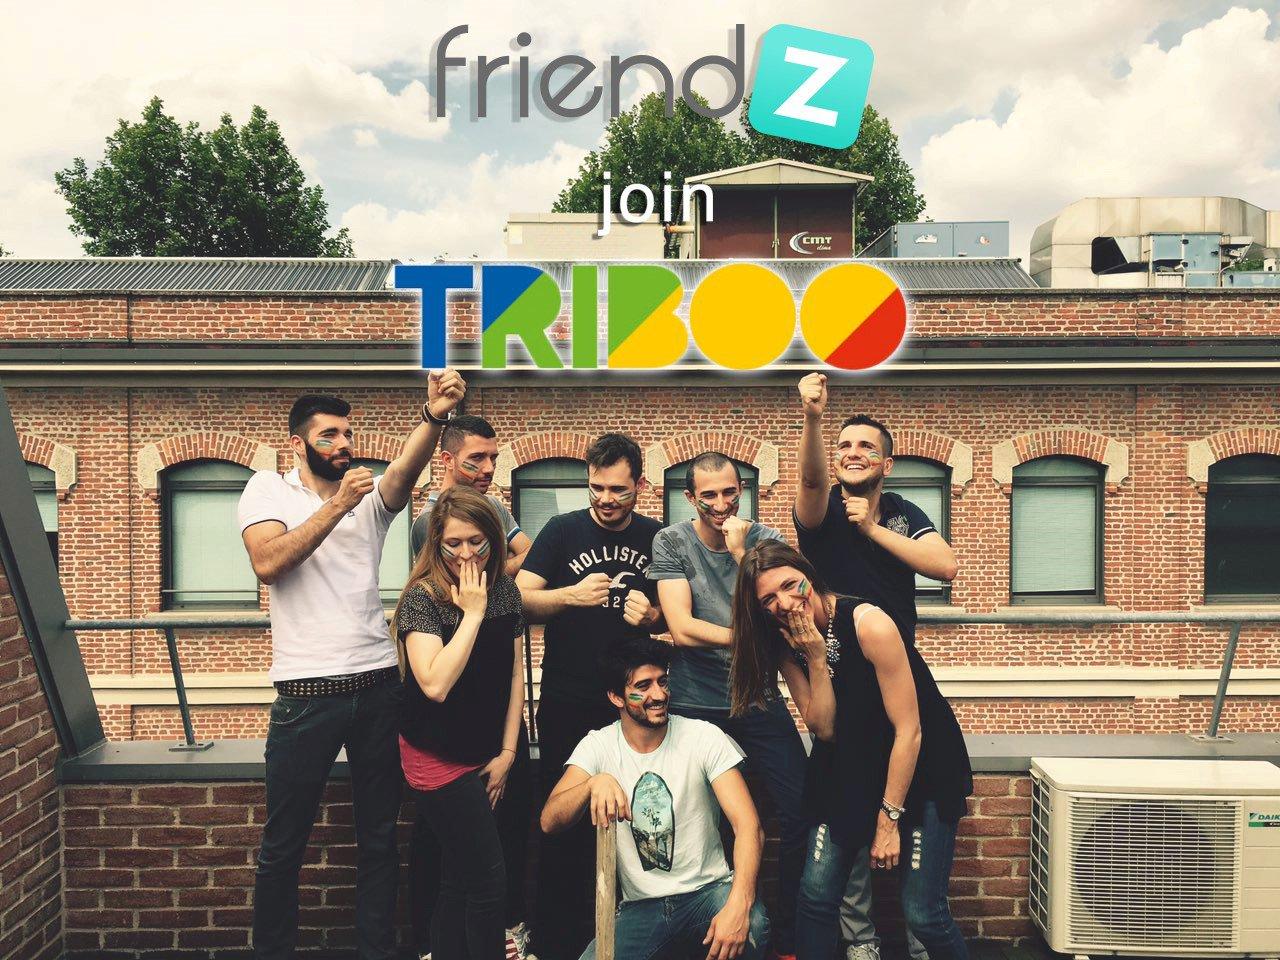 Friendz_Triboo